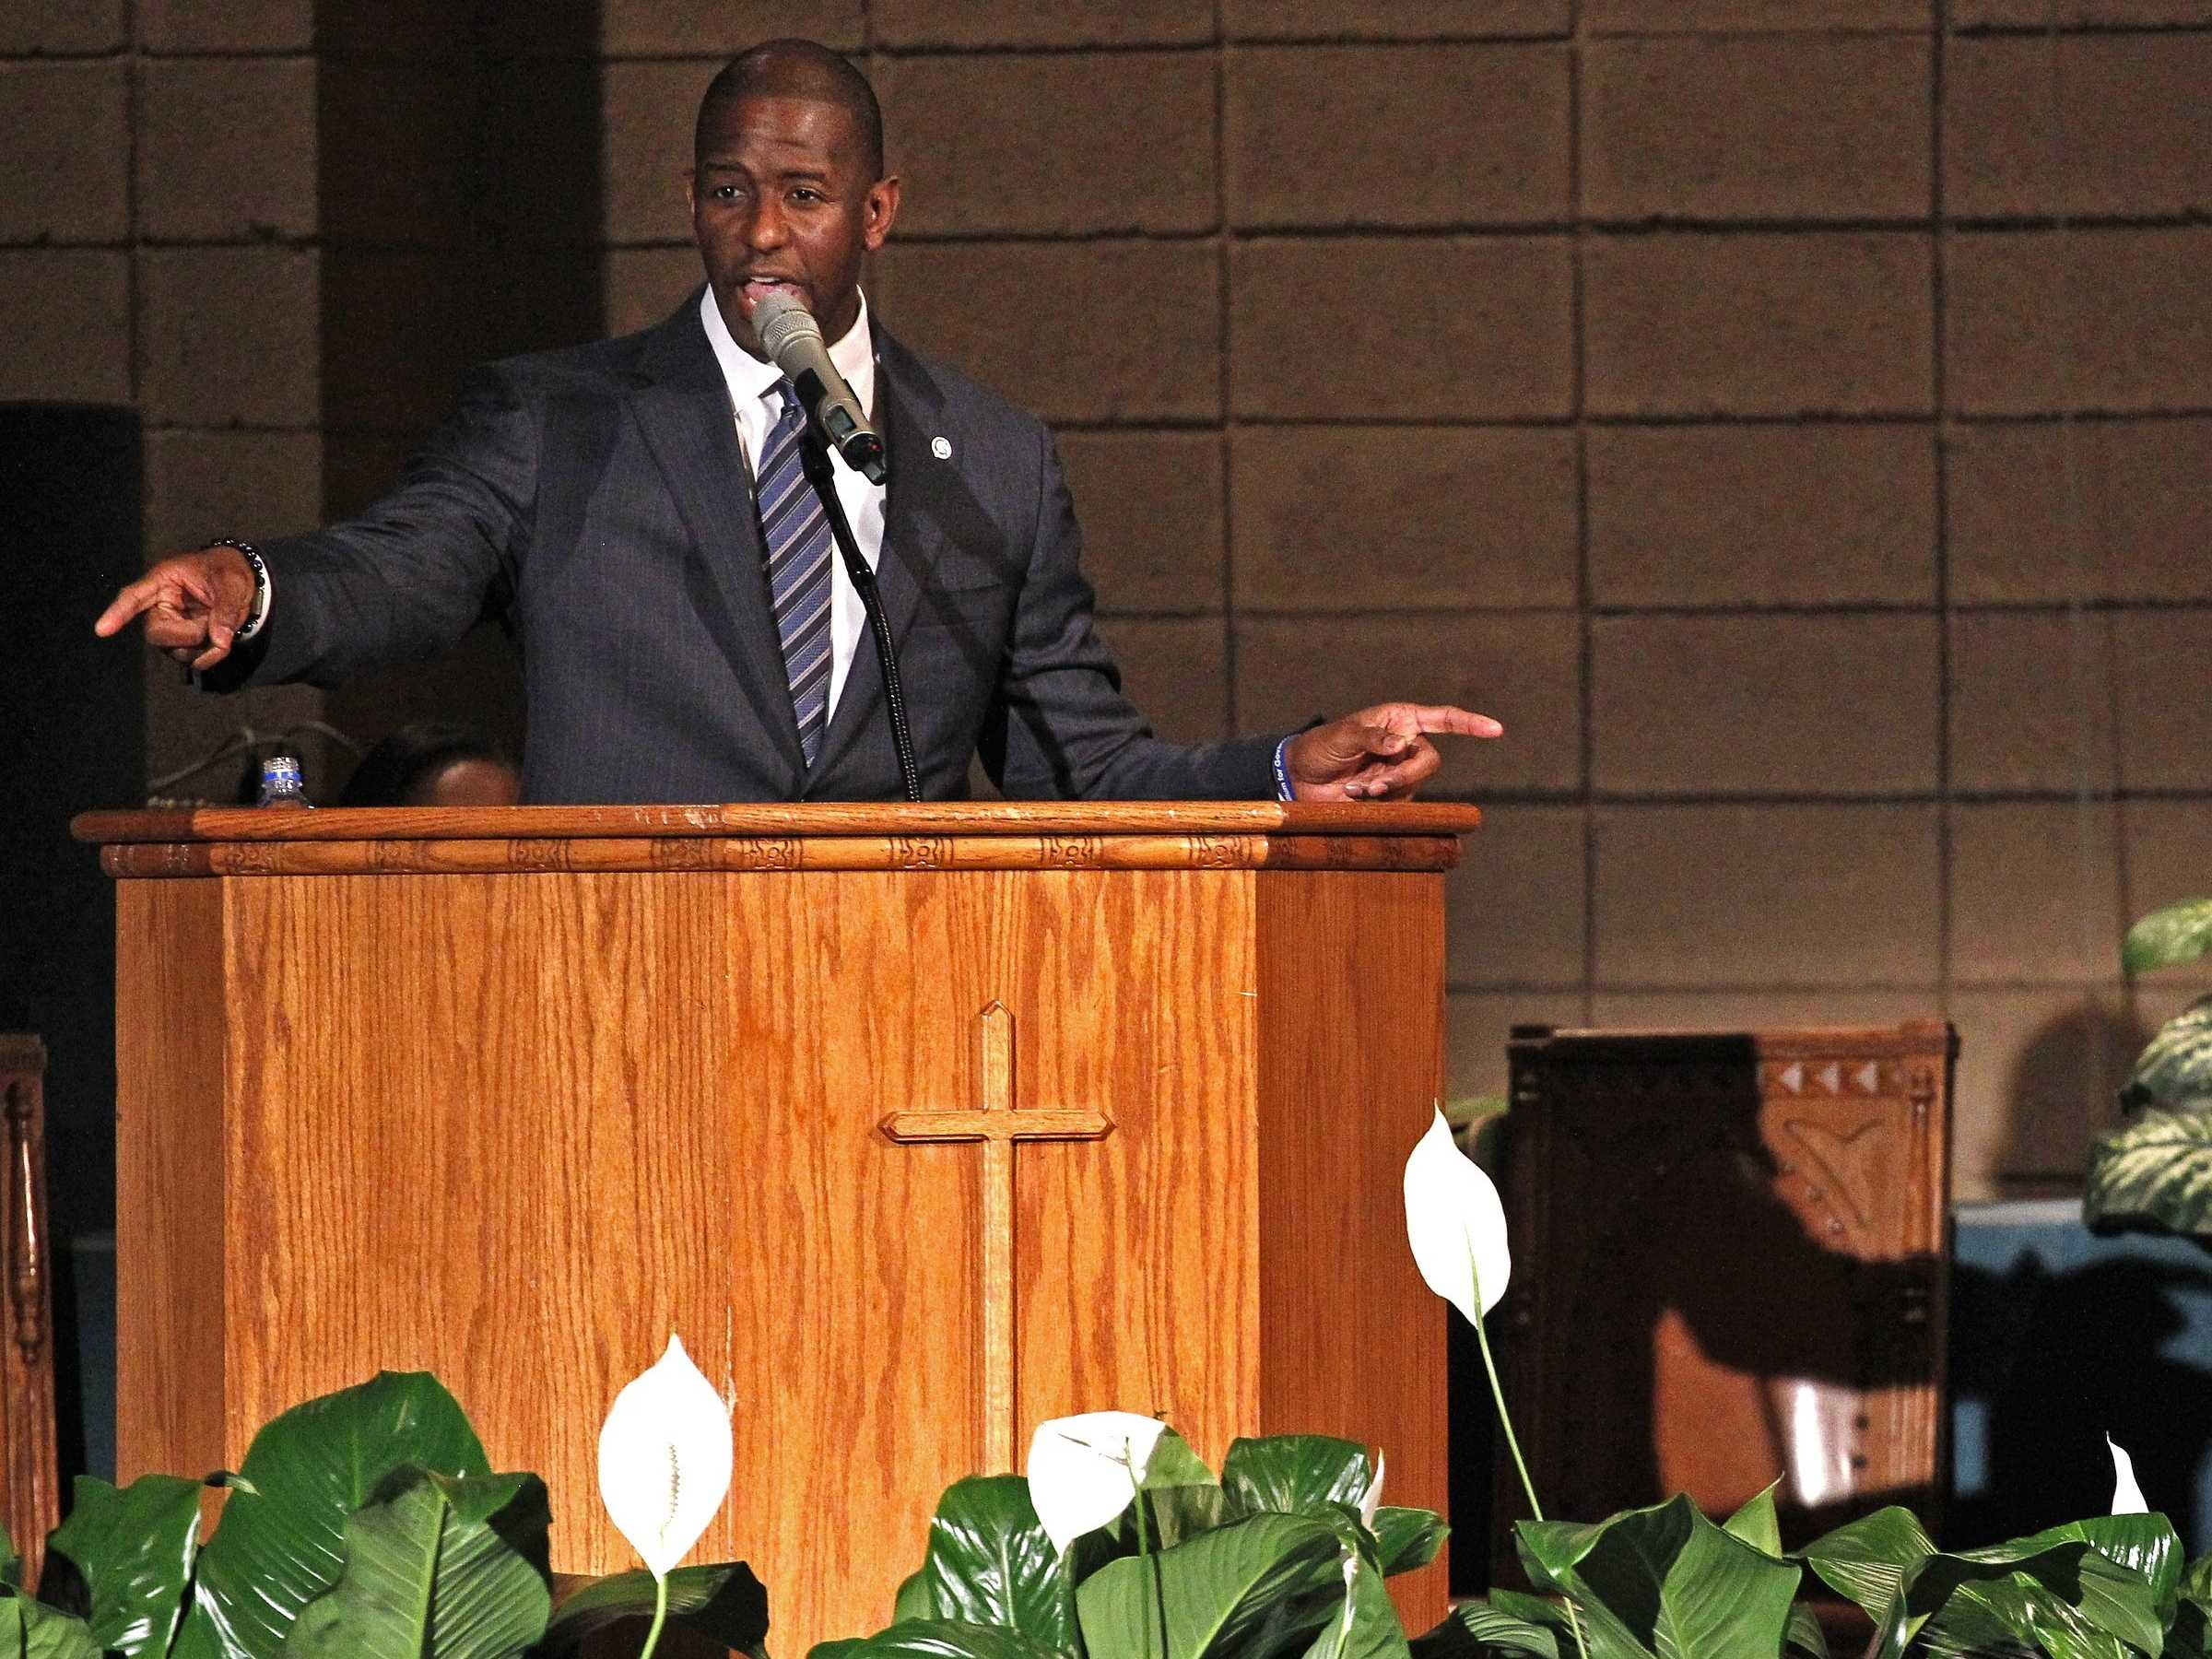 1st Black Democratic Nominee for Florida Gov Gives Up Race